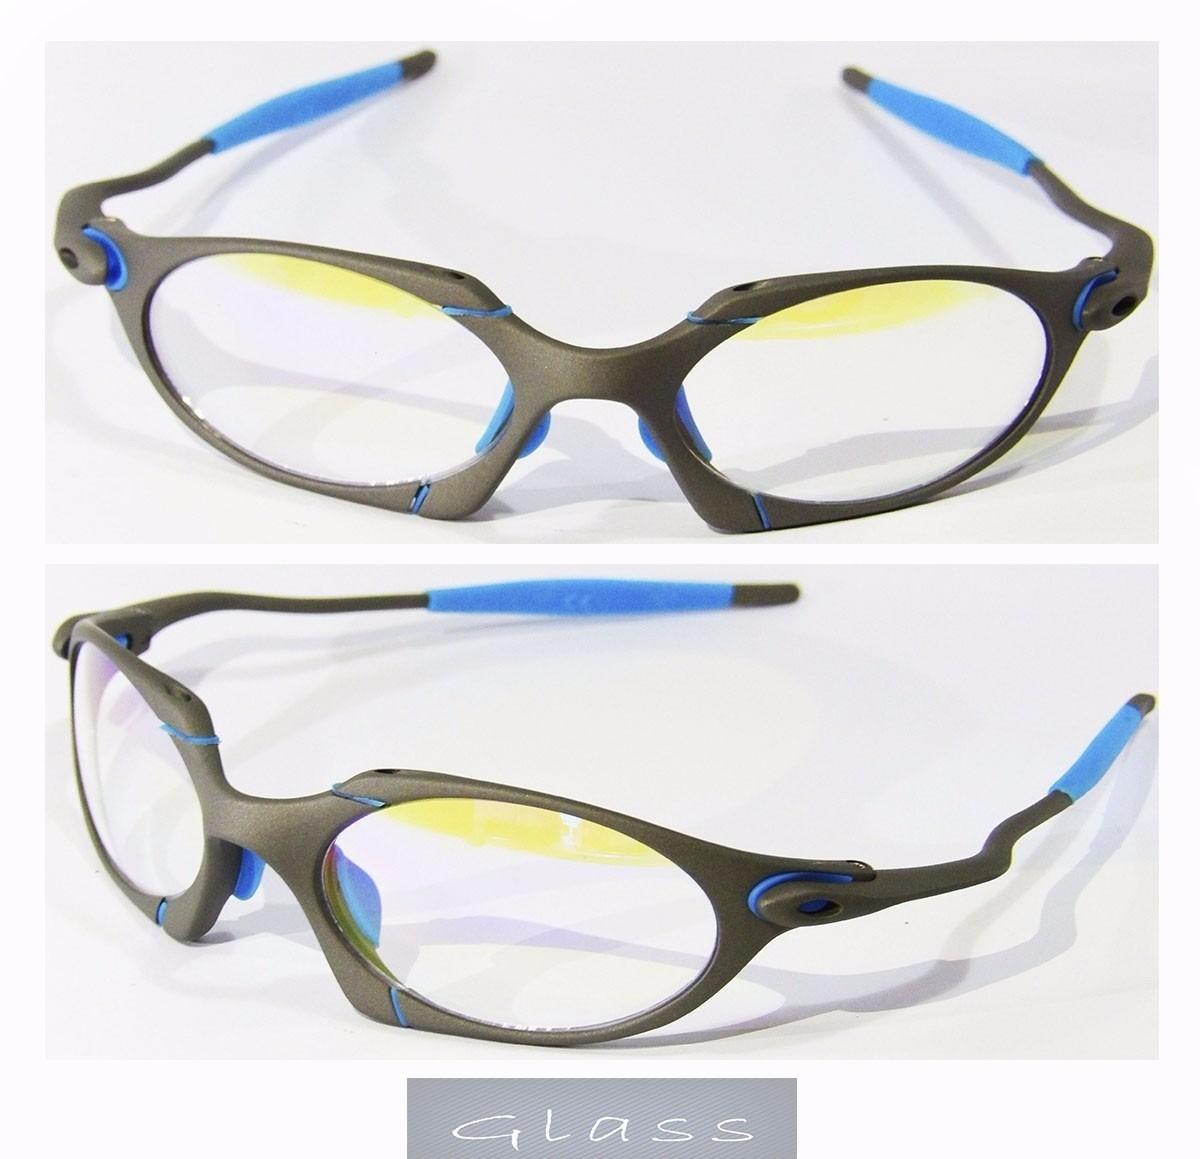 9ce947c4e5310 oculos oakley romeo r1 juliet xsquared 24k original. Carregando zoom.